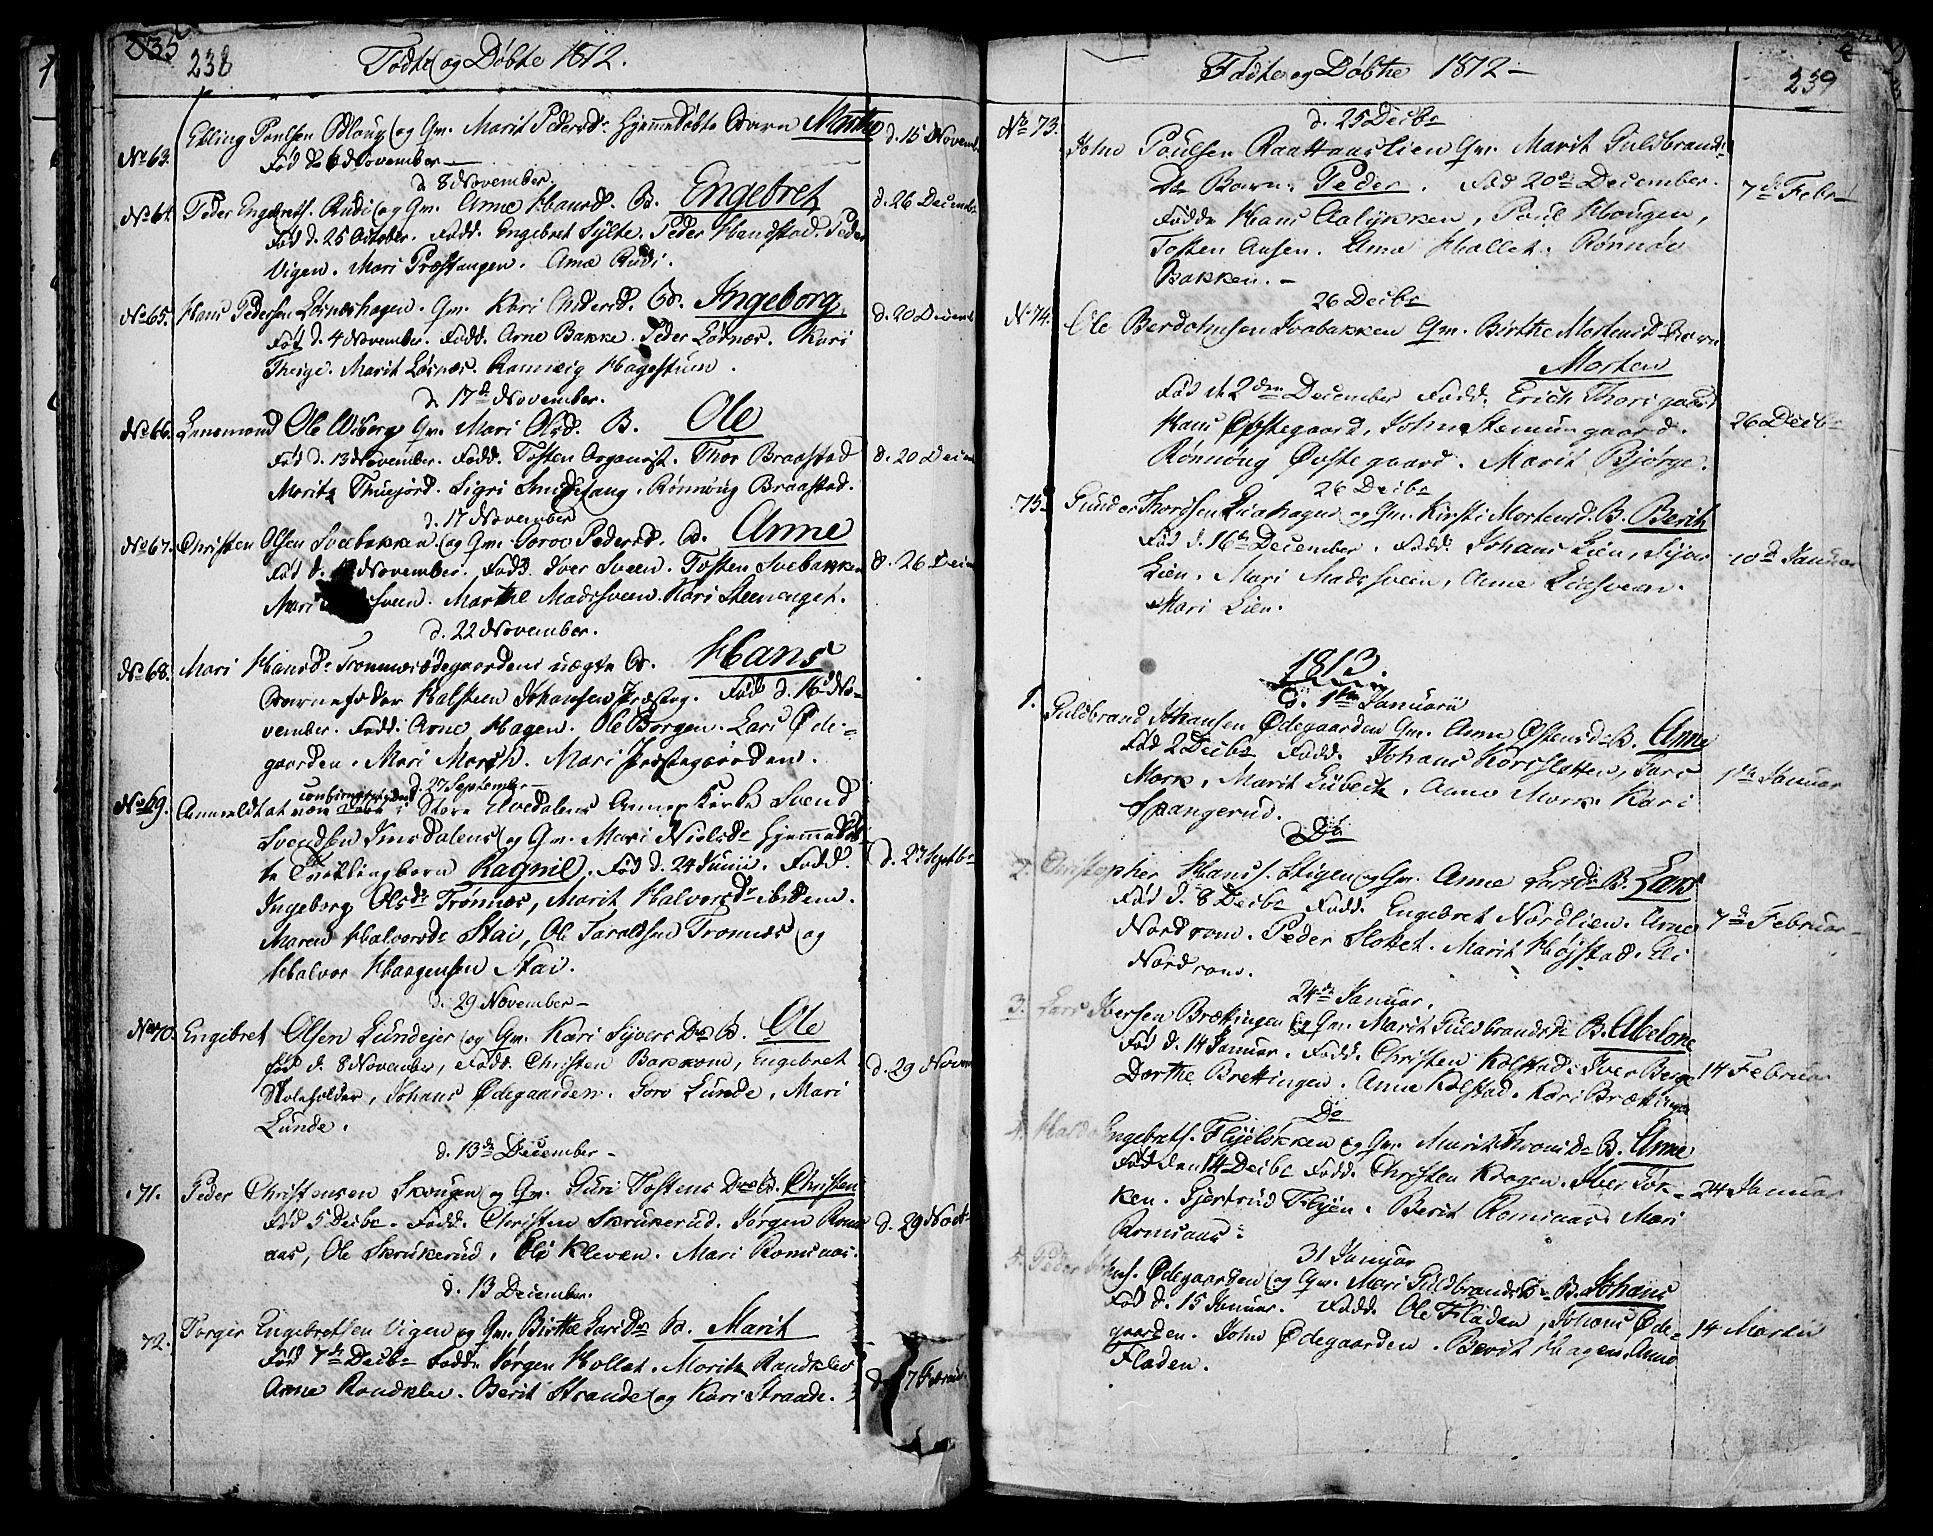 SAH, Ringebu prestekontor, Ministerialbok nr. 3, 1781-1820, s. 238-239